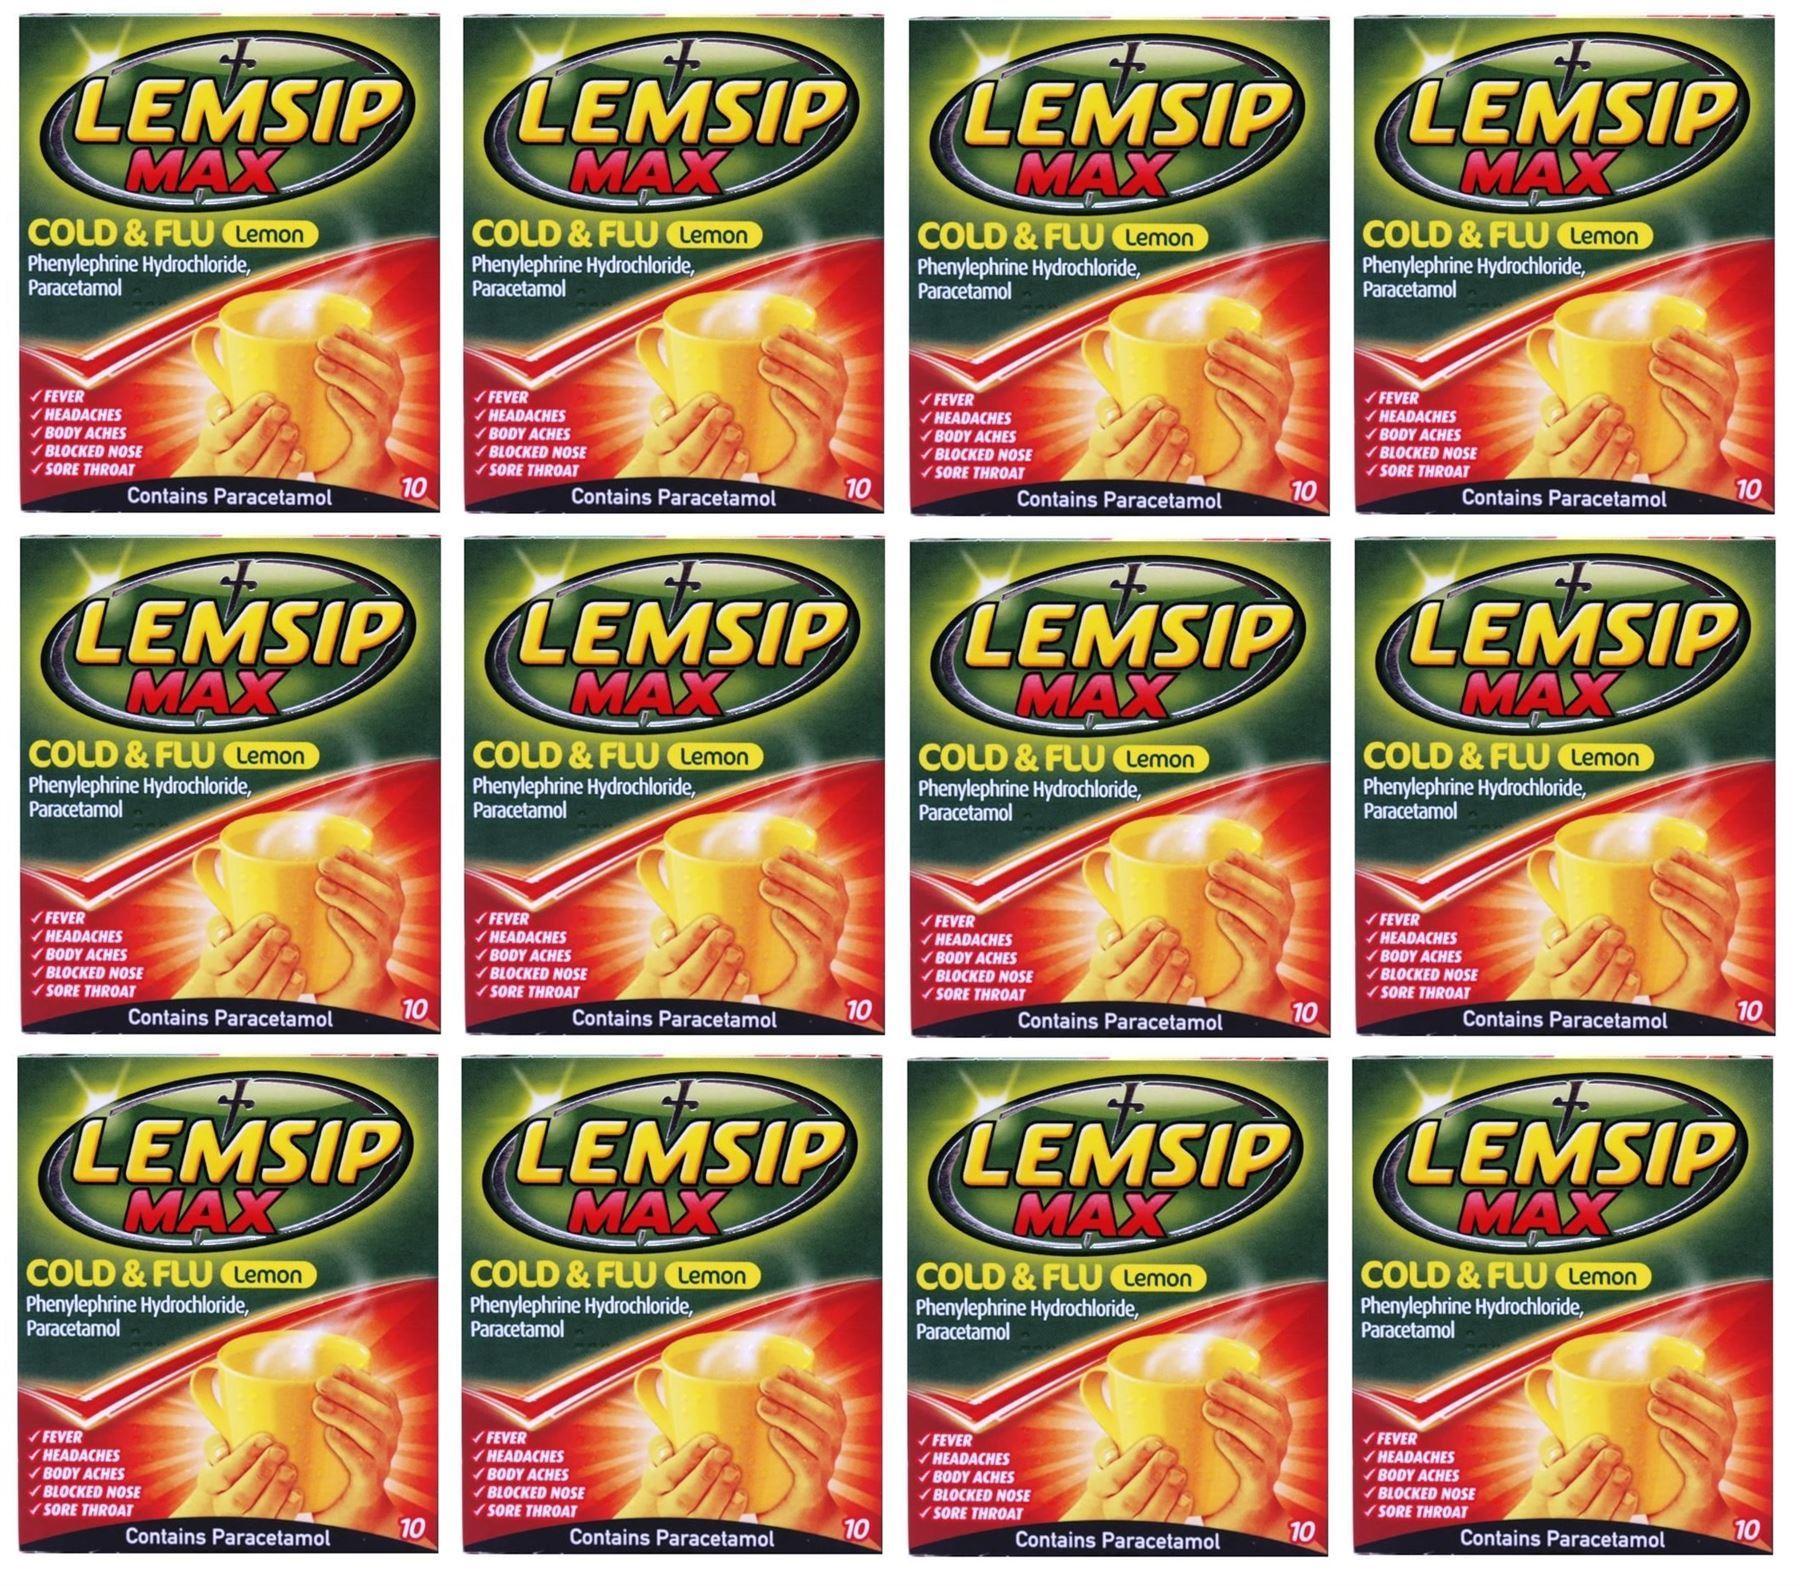 Lemsip-Max-Cold-amp-Flu-Lemon-Hot-Drink-10-Sachets-1-2-3-6-12-Packs